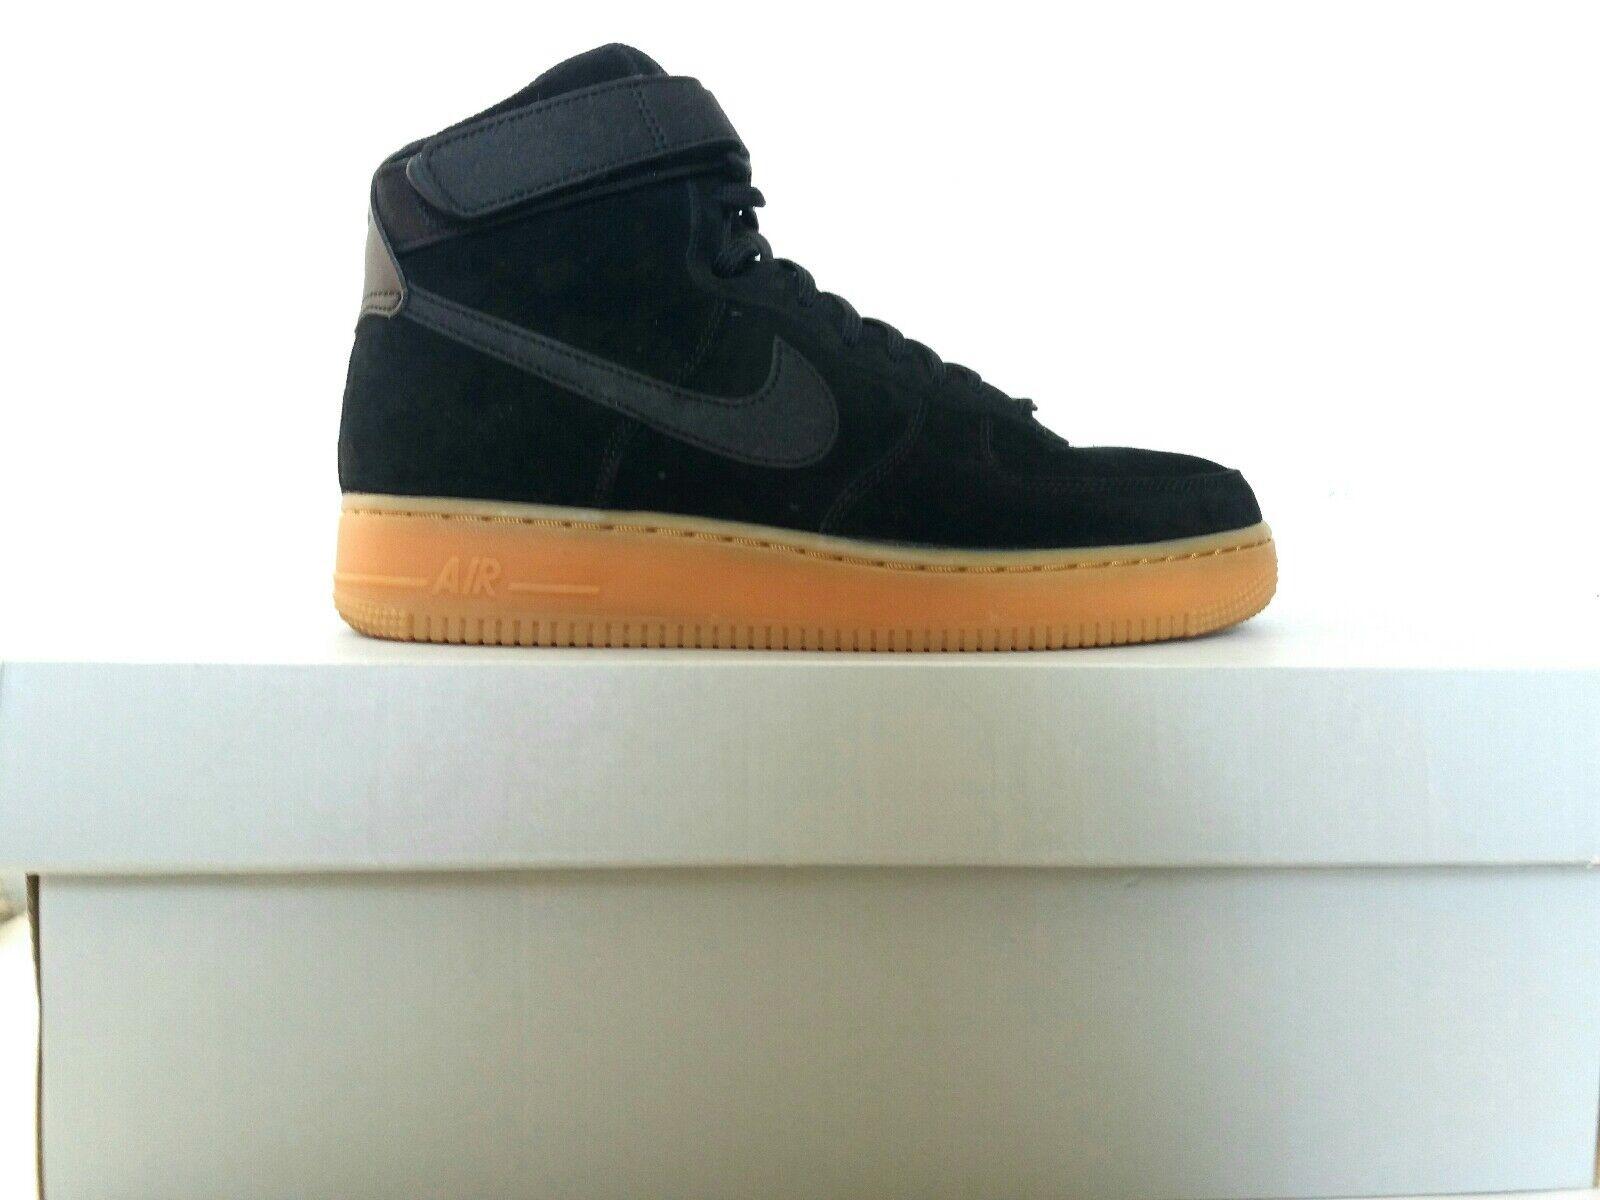 Nike Air Force 1 Black Size UK 7 US 9.5